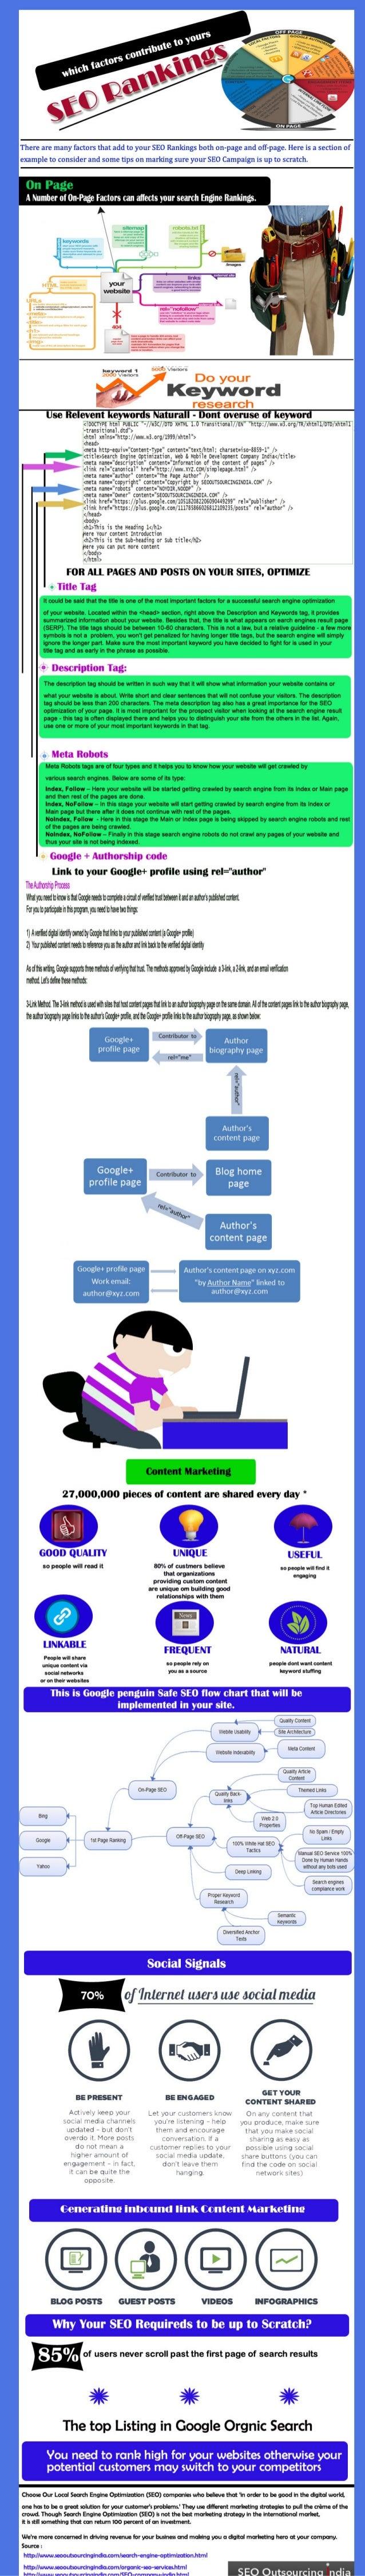 Seo rankings Factor 2013 - Infographics